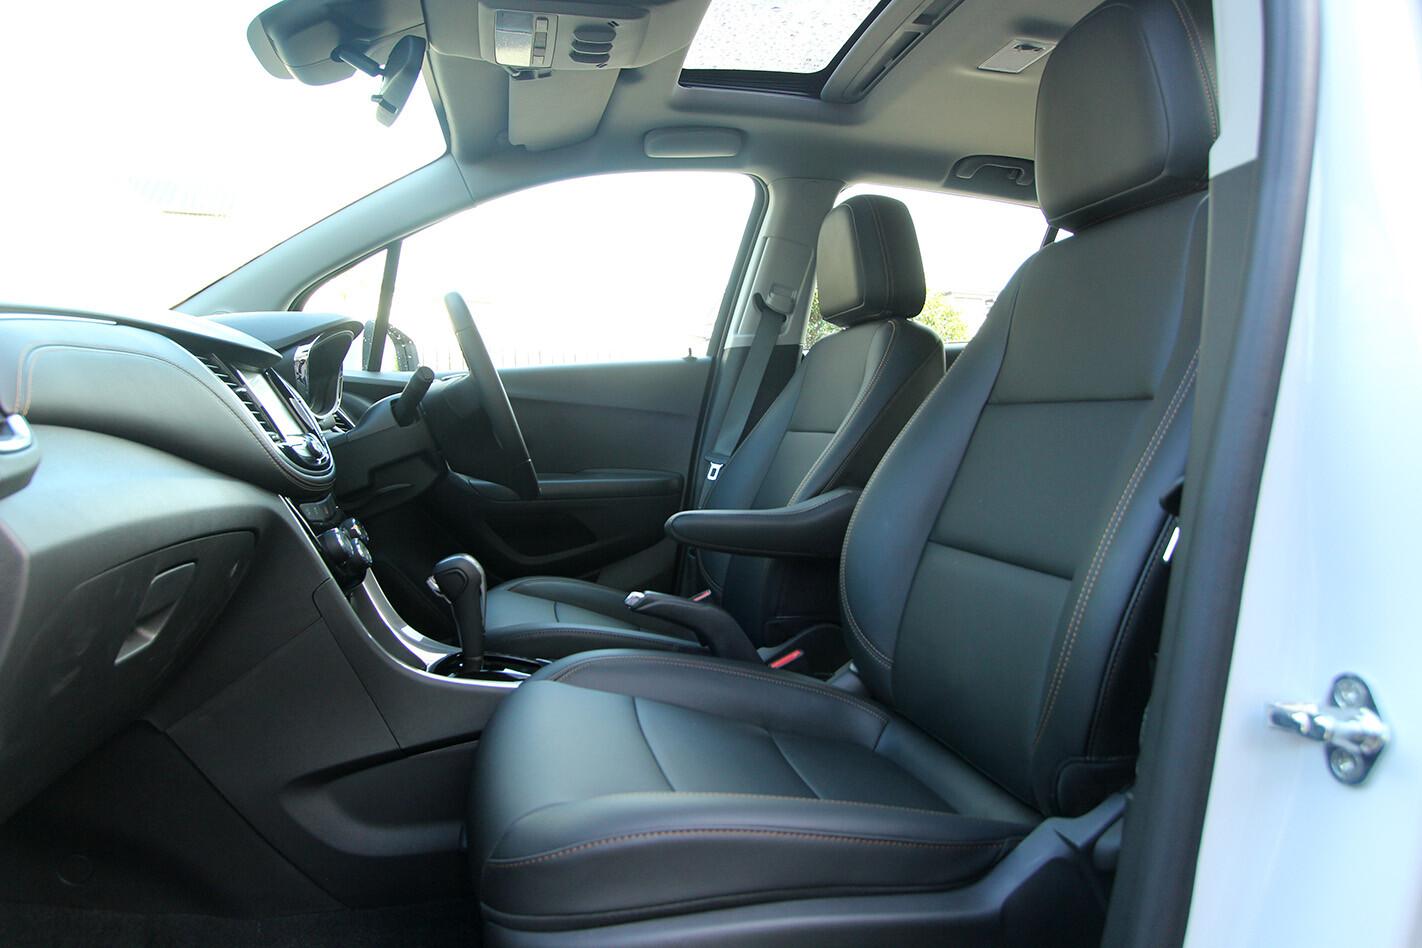 2019 Holden Trax Ltz Review Interior Frontseats 281 29 Jpg